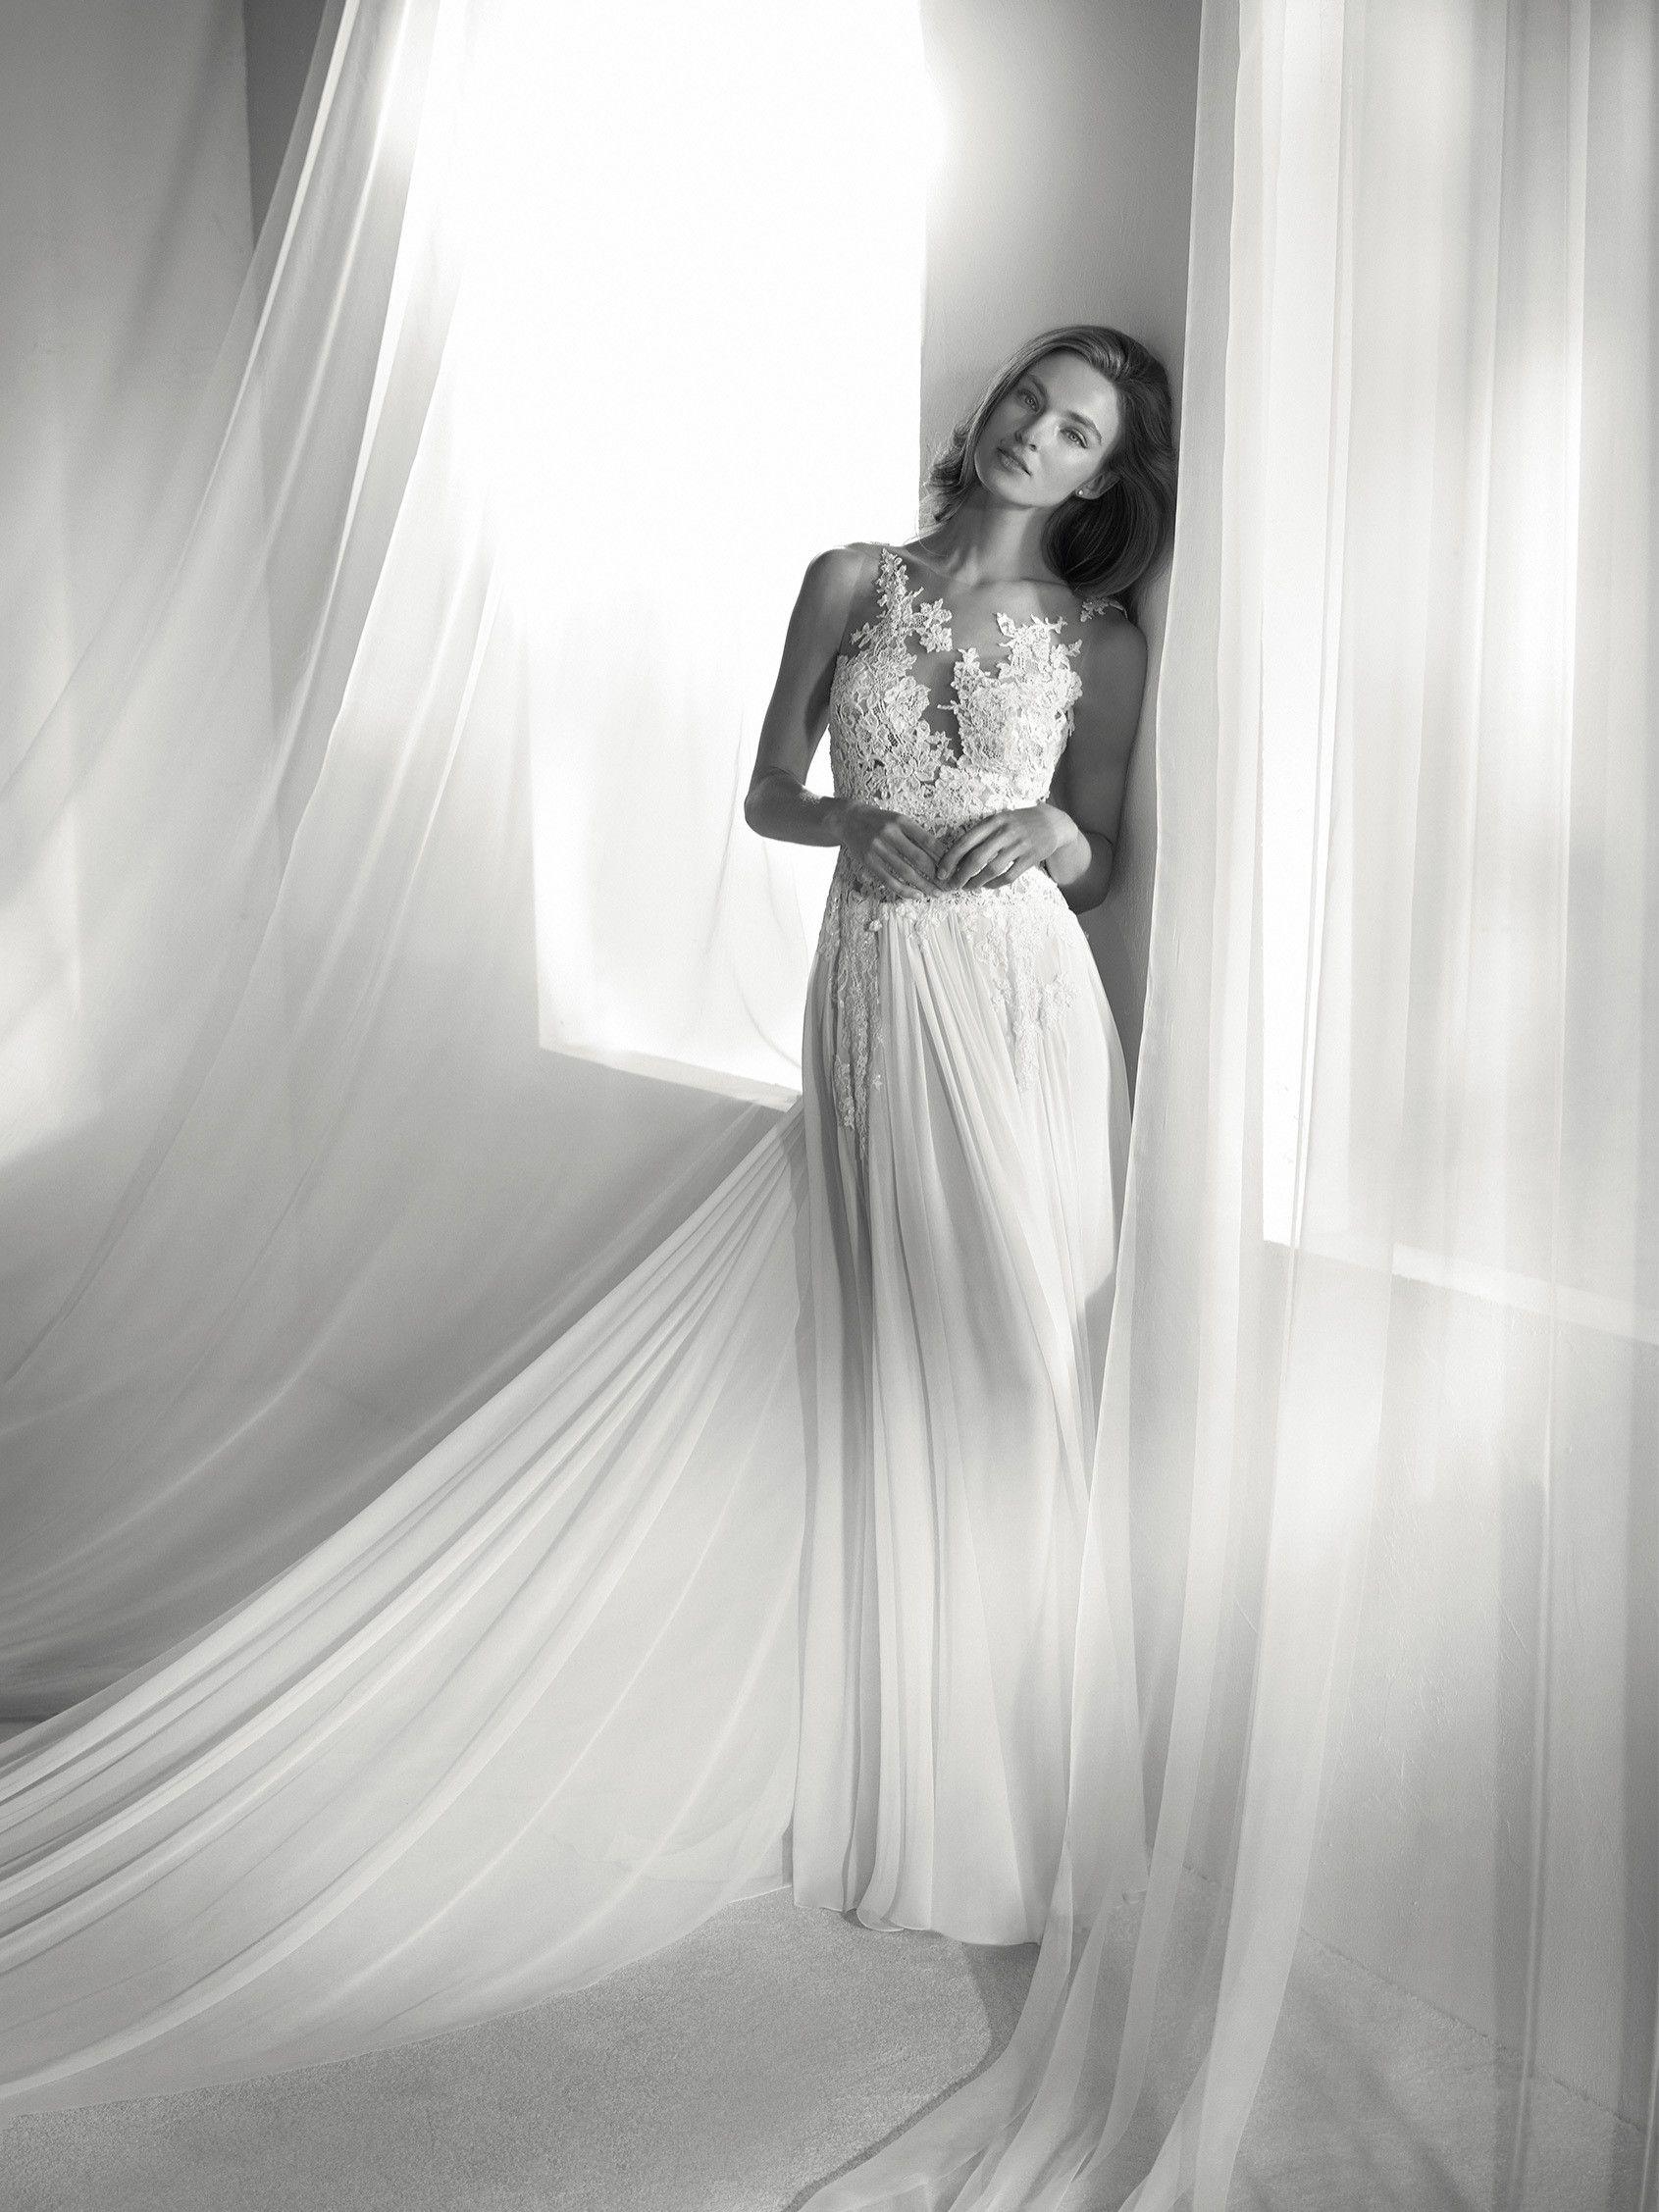 Vestido de novia tul y encaje | wedding | Pinterest